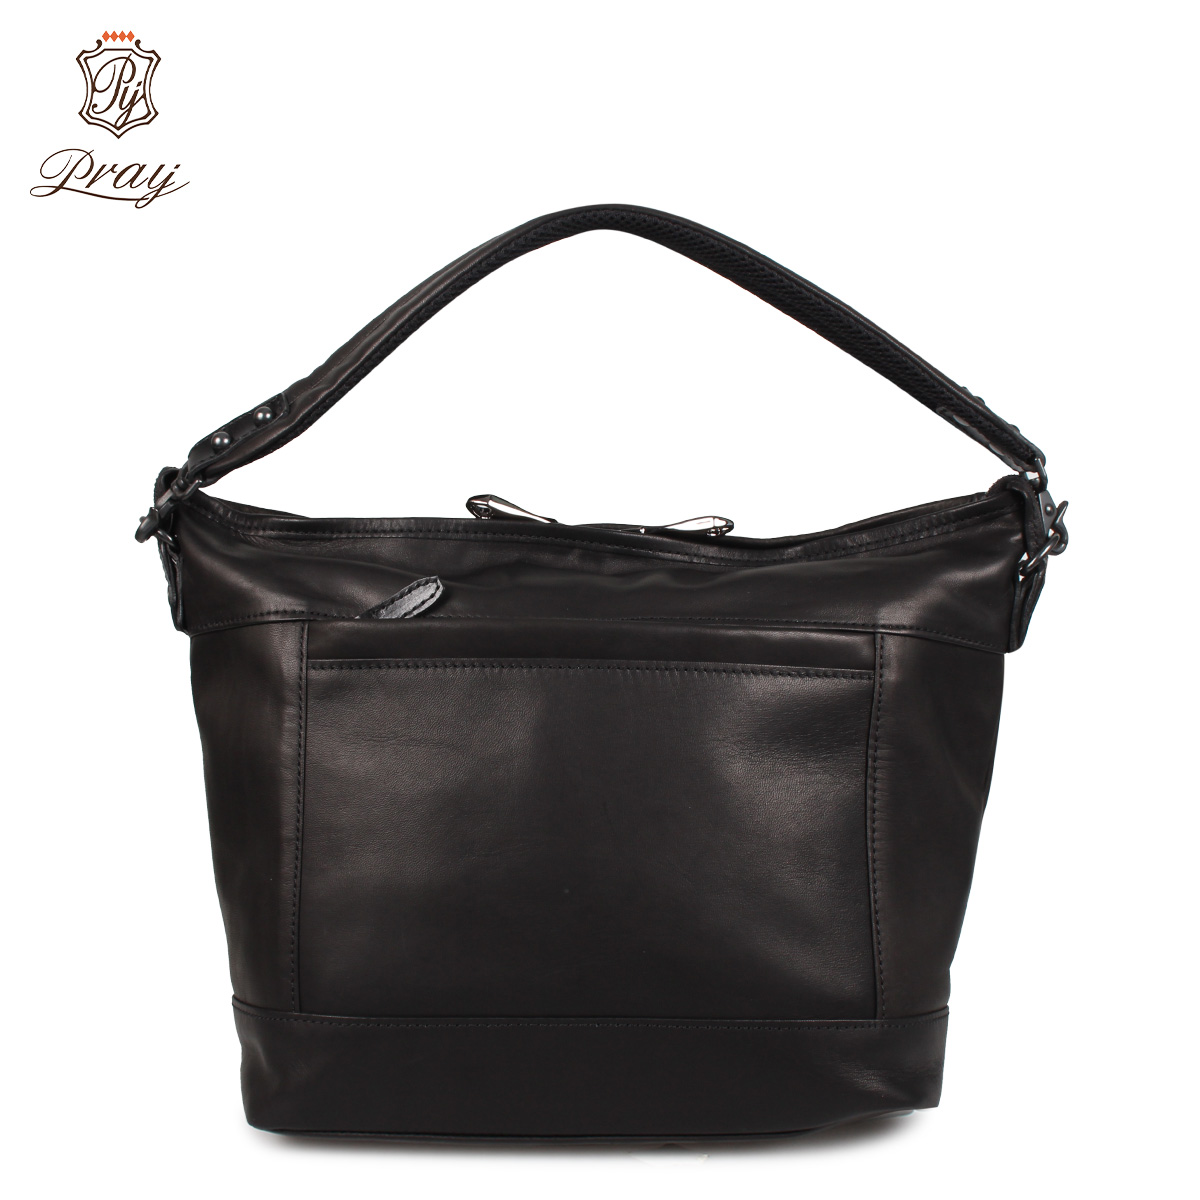 PRAY プレイ バッグ ショルダーバッグ メンズ MINI SHOULDER BAG ブラック 黒 PRSHD-302 [4/6 新入荷]